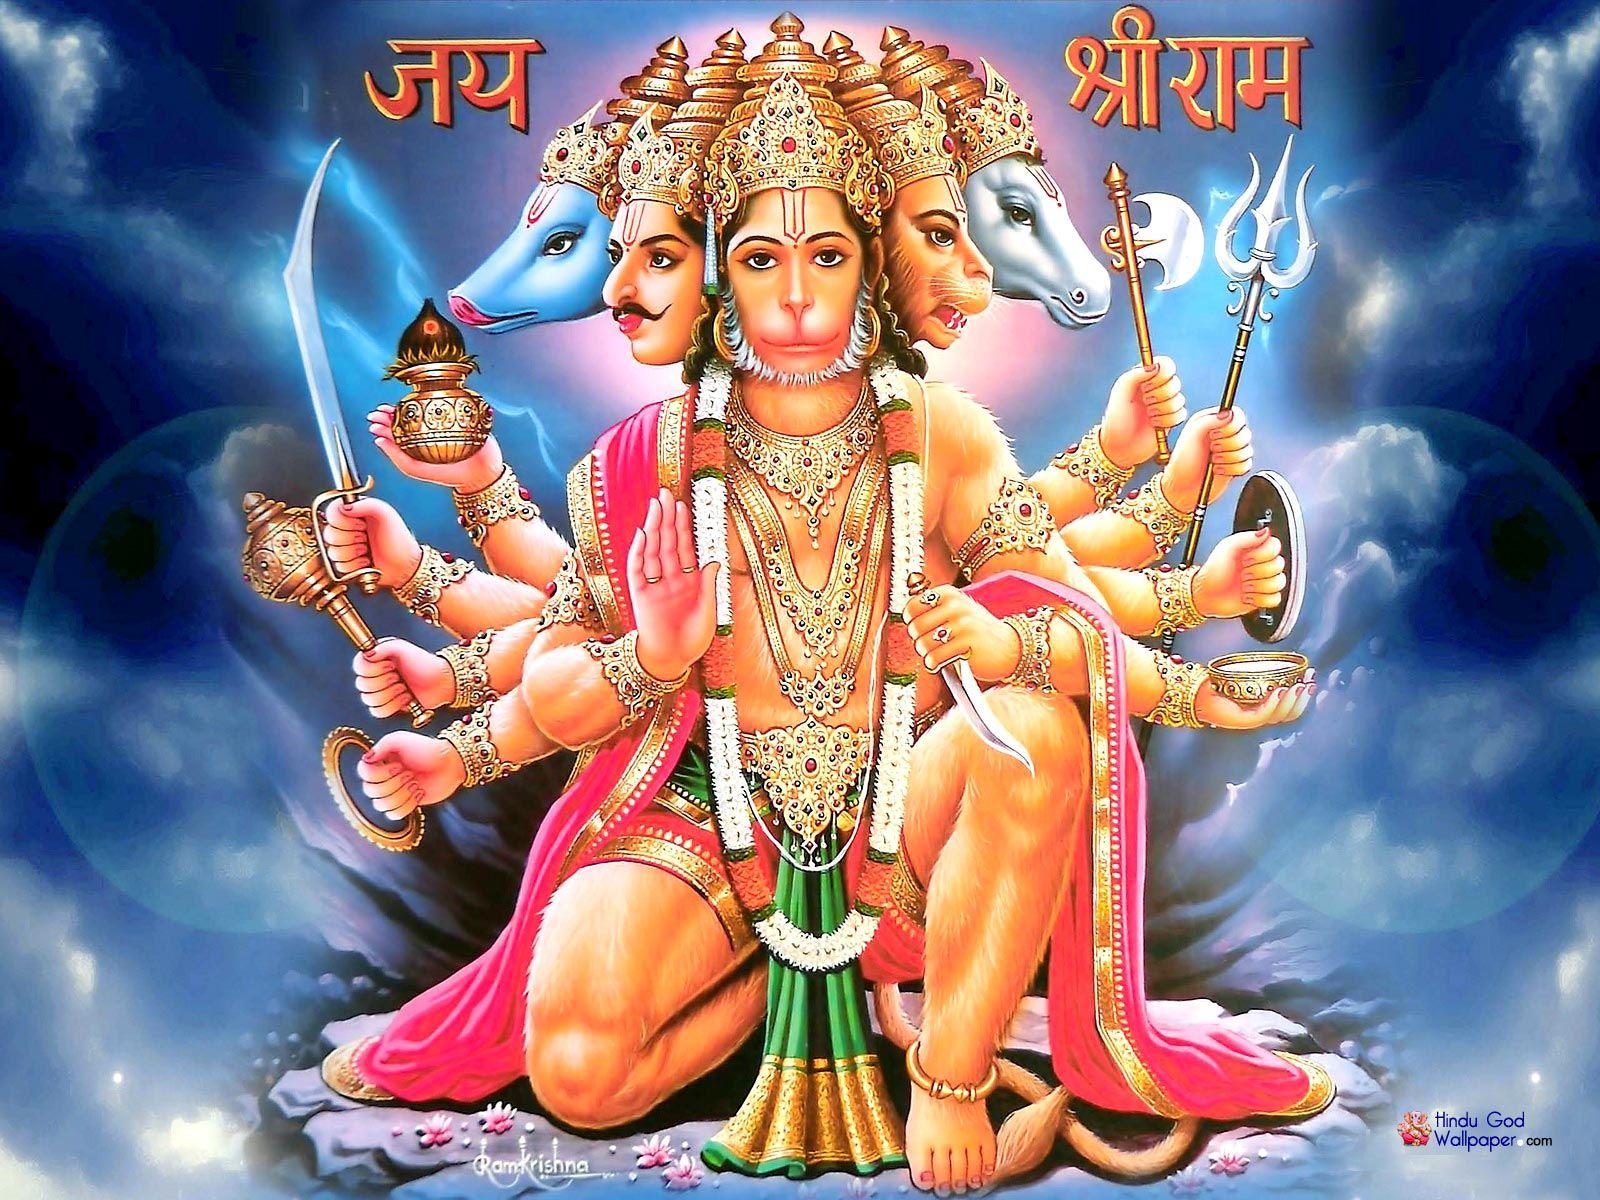 Rama Kidnapped Panchamukhi Hanuman Origin In Wormhole Hanuman Wallpaper Shri Hanuman Hanuman Hd Wallpaper Hanuman hd wallpapers download